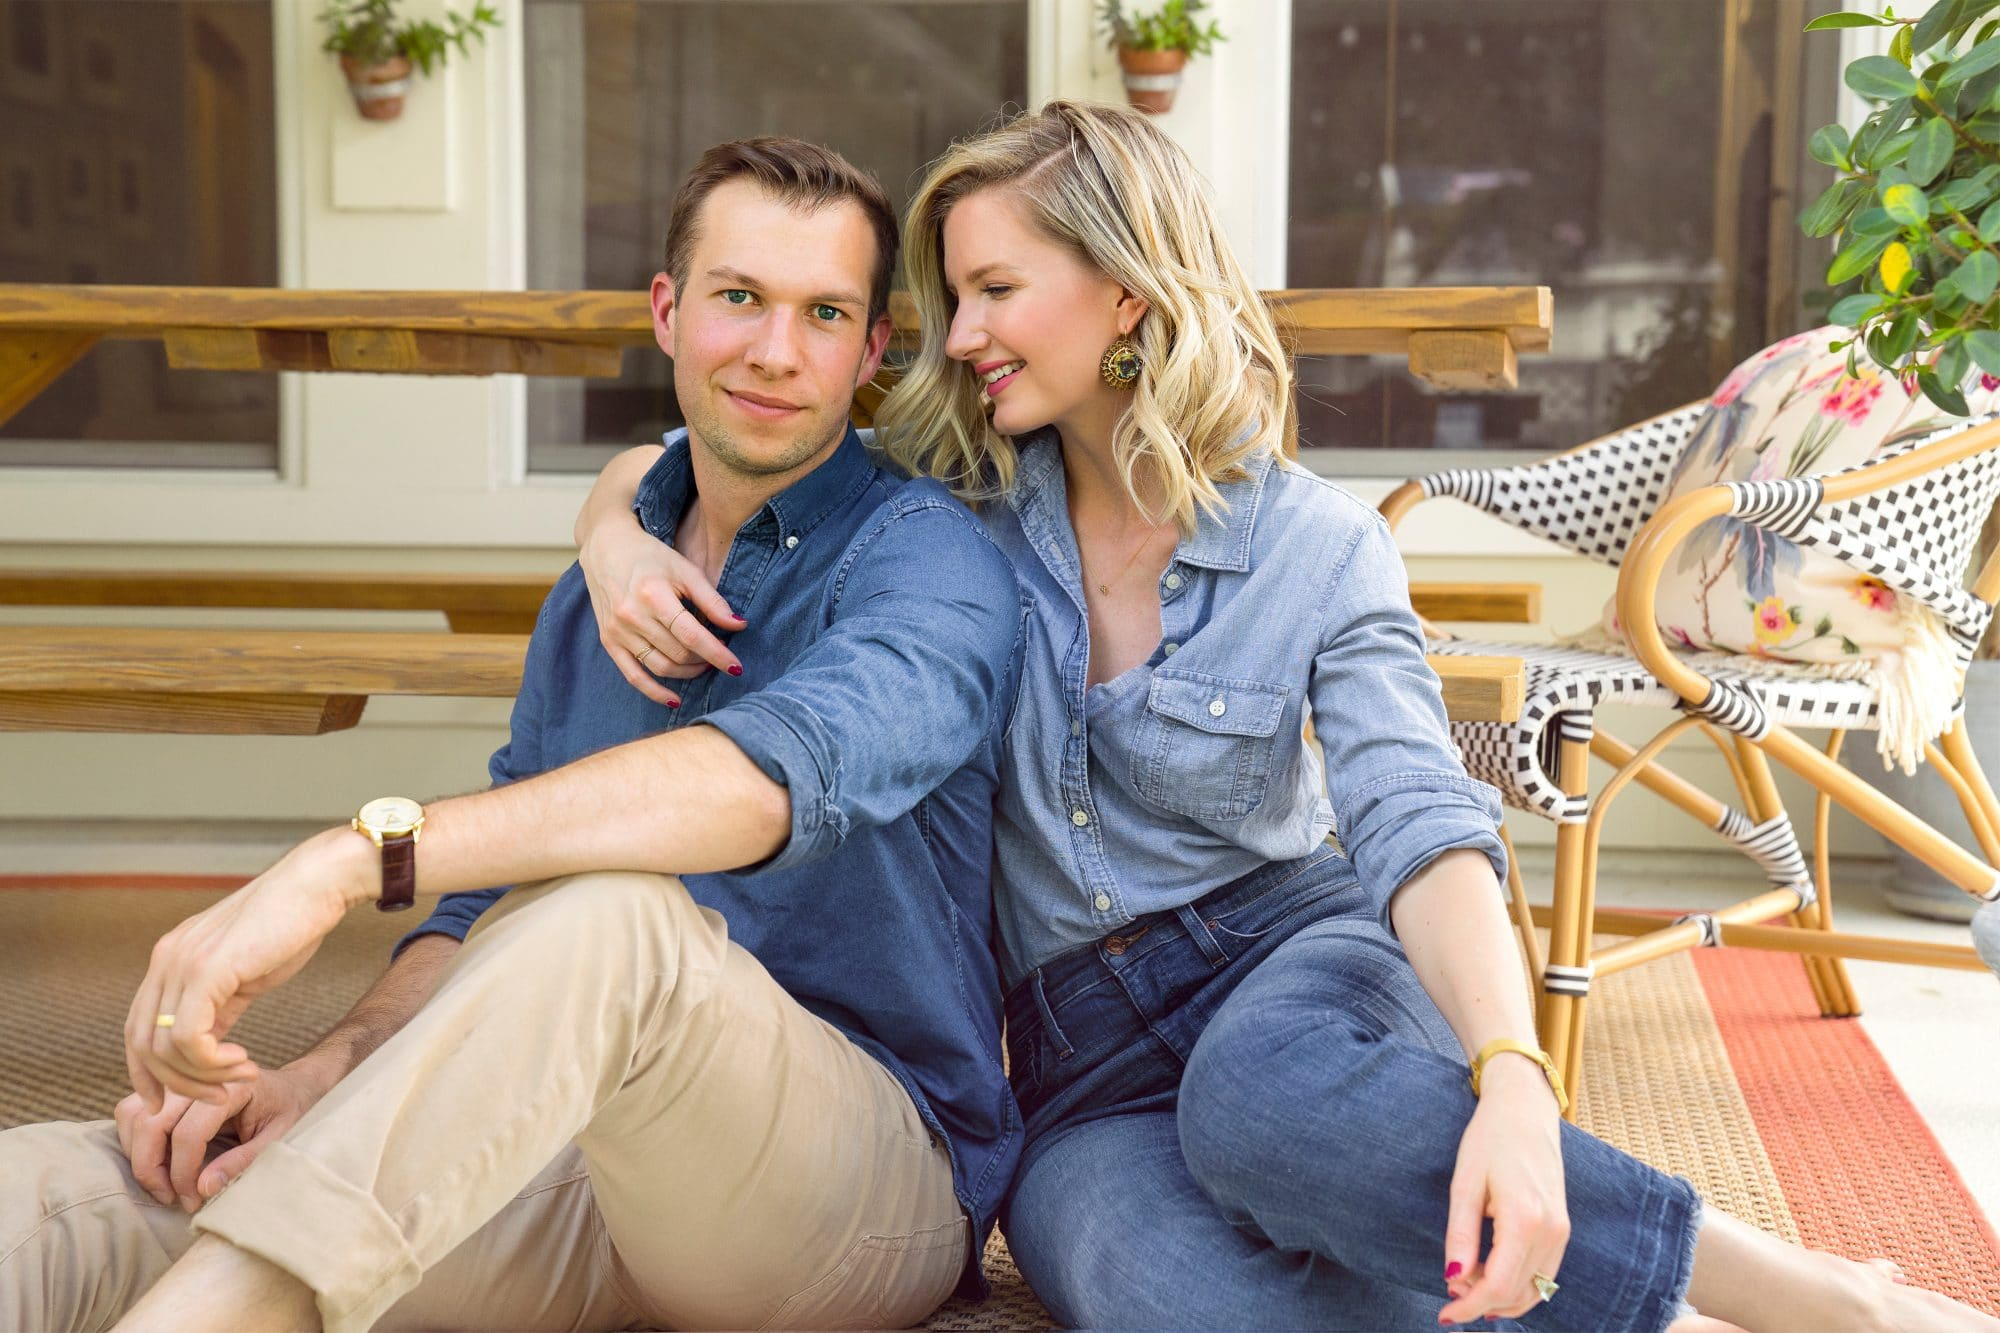 Ashley and Ryan